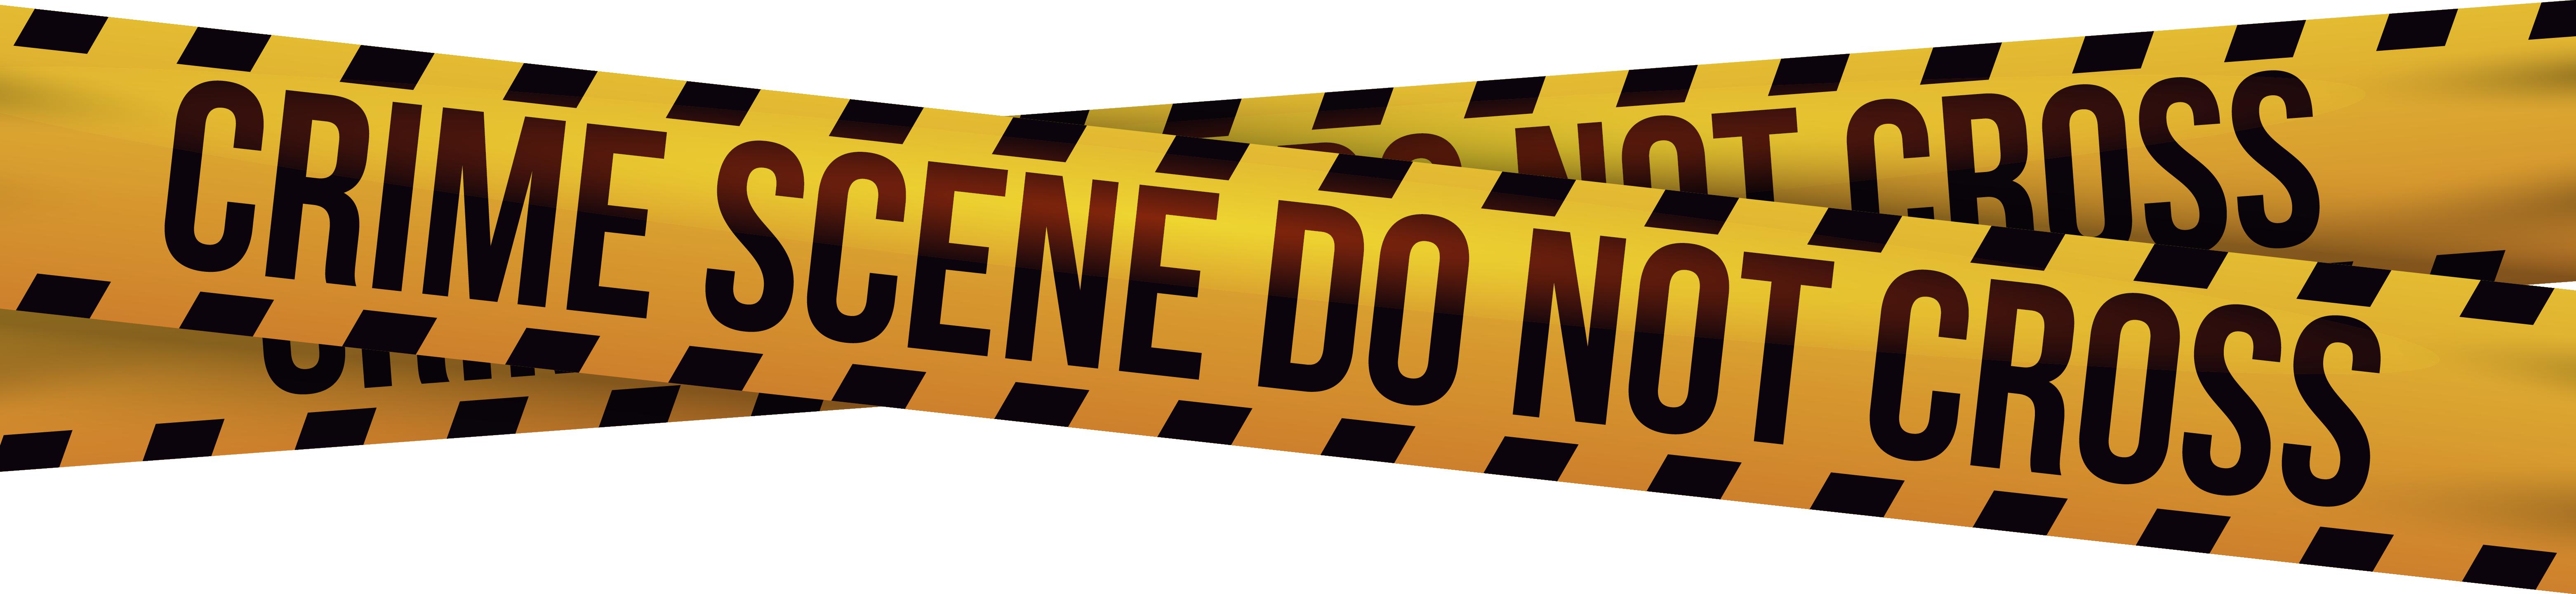 Criminal clipart minor. Police tape png images